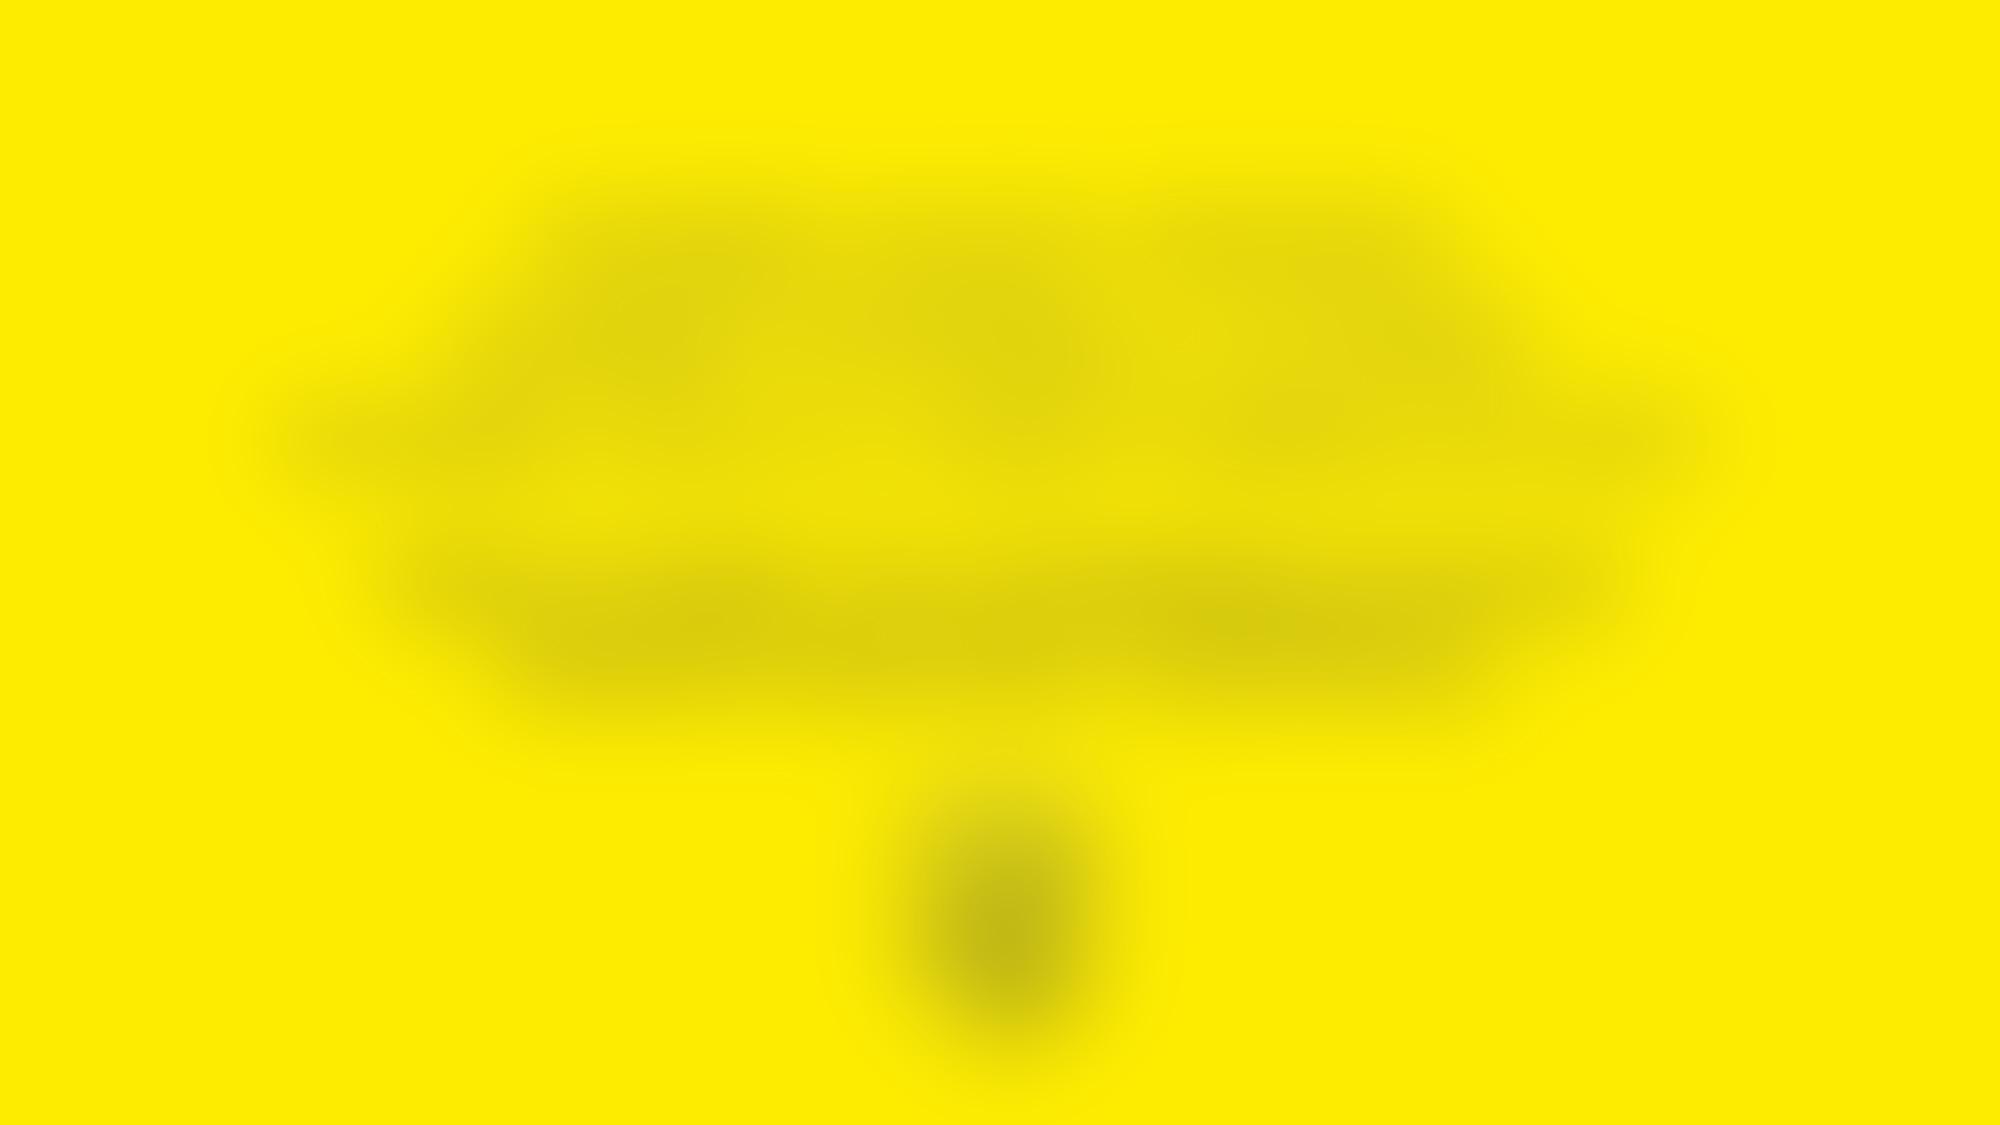 Club Copy Press Release Manchester Central autocompressfitresizeixlibphp 1 1 0max h2000max w3 D2000q80se9cb48b3fa102e6683ec9558164f681d